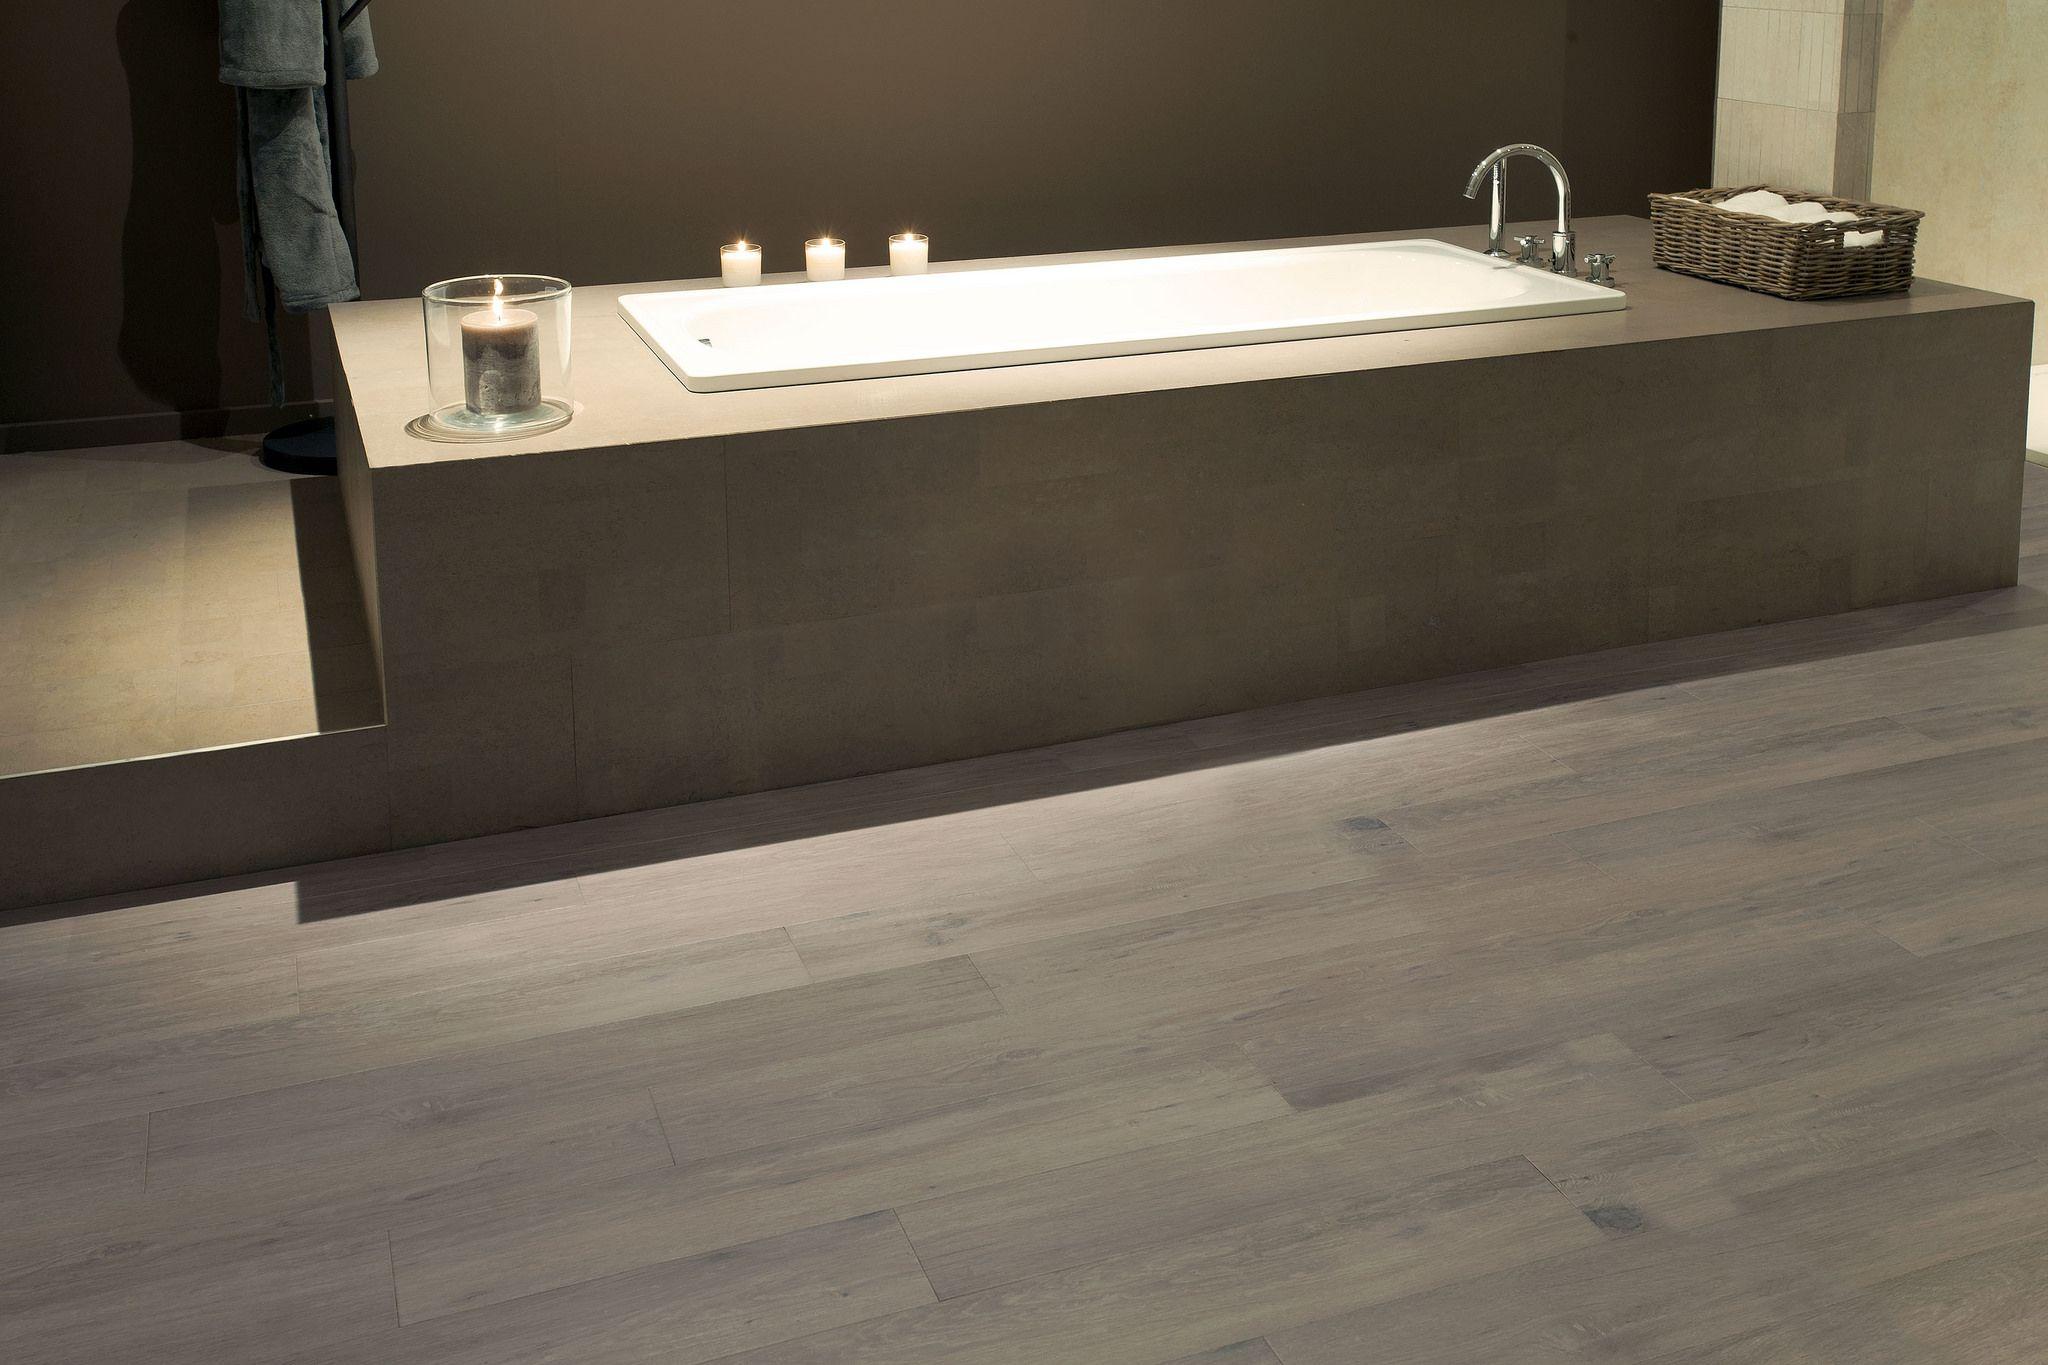 Kurkvloer houtlook badkamer in 2018 pinterest bathroom home